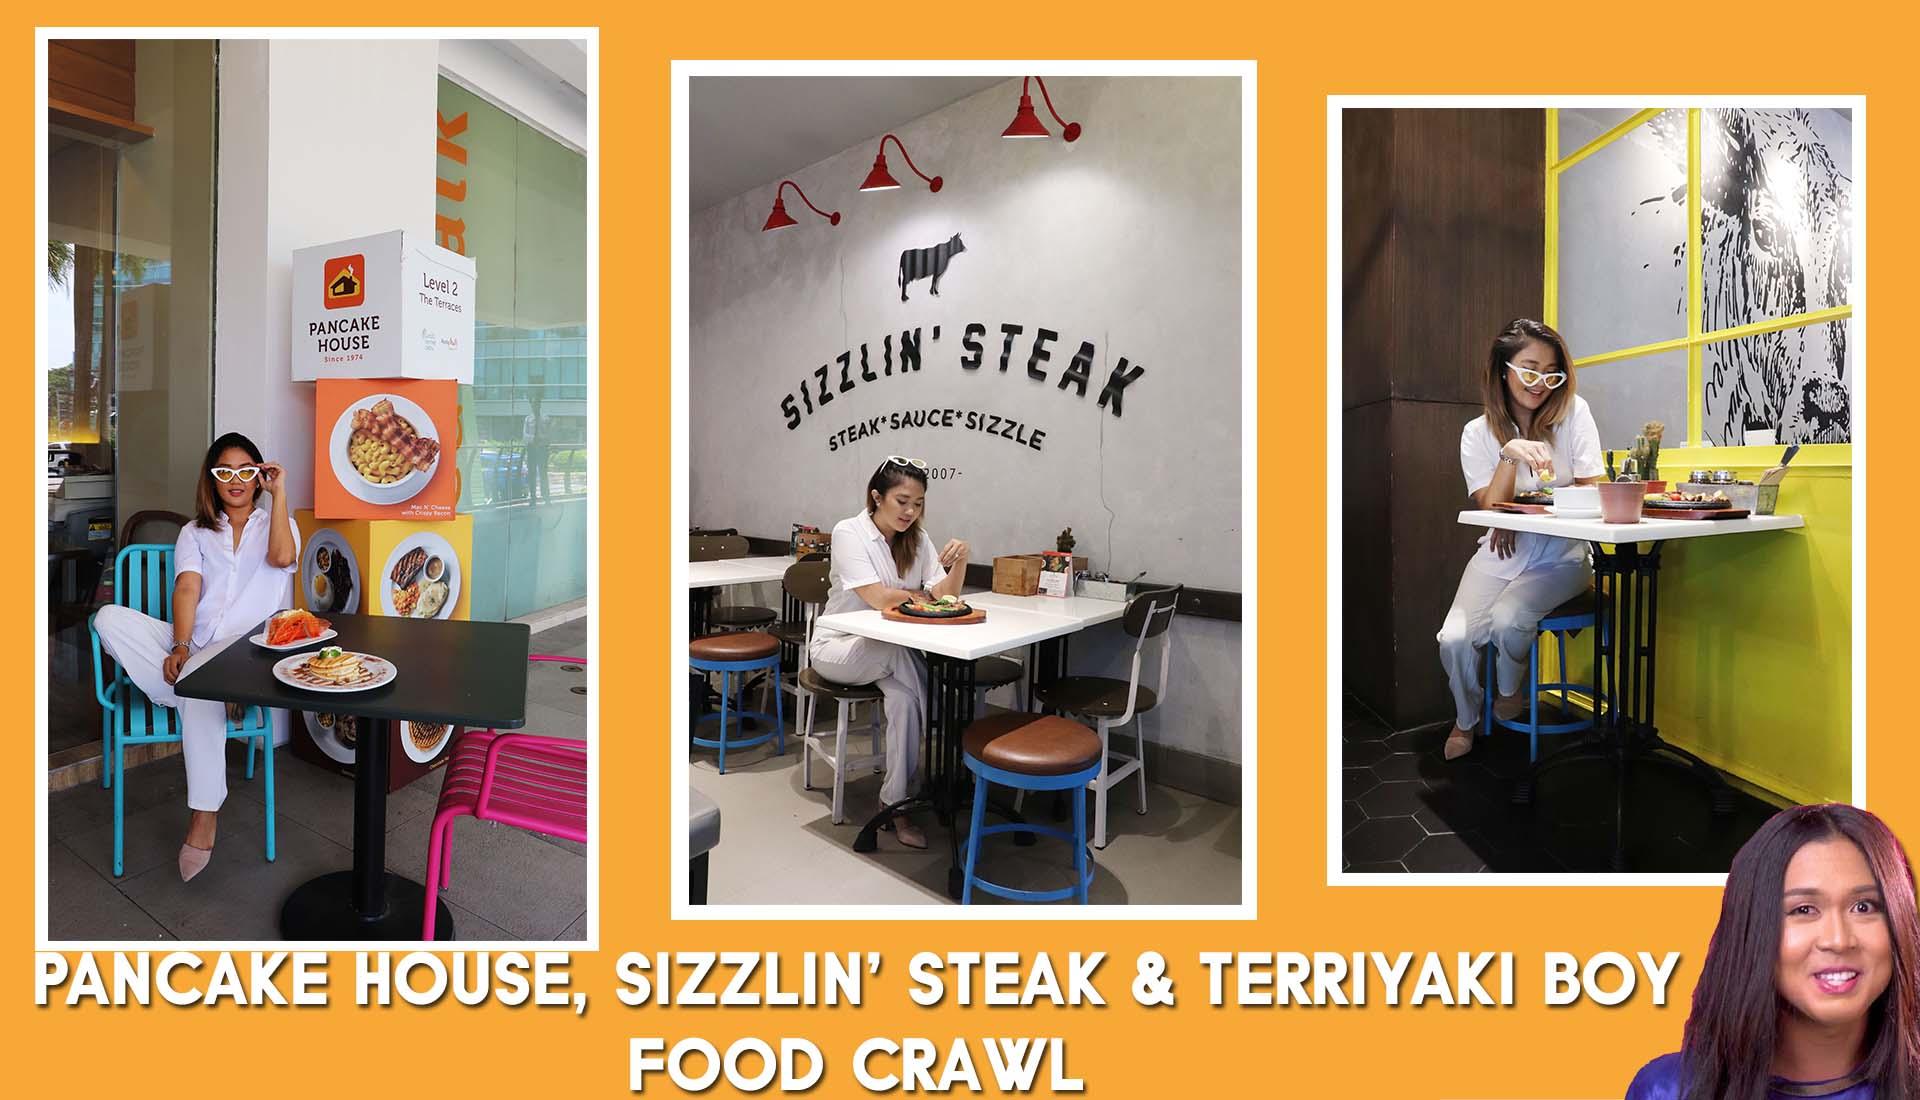 [Blog & Vlog] Exploring The Specialties of Pancake House, Sizzlin' Steak & Terriyaki Boy